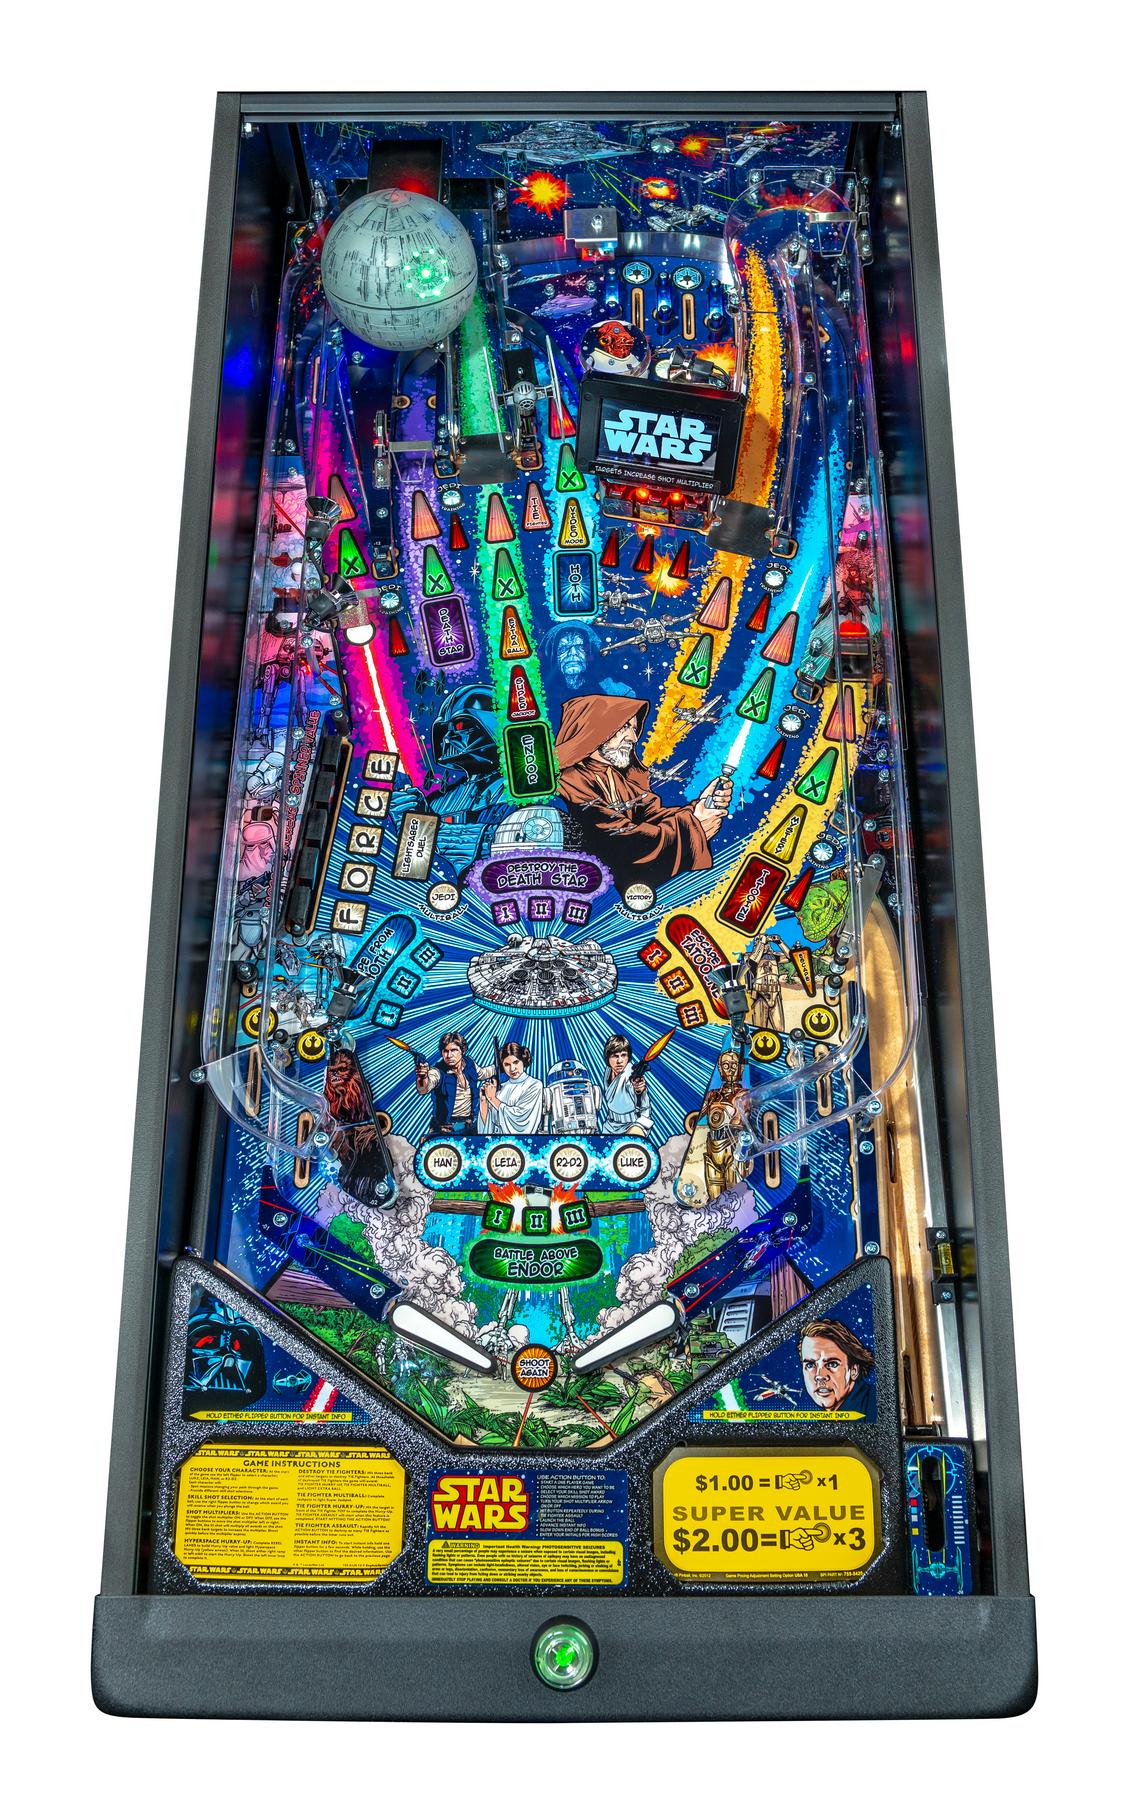 STAR WARS COMIC ART PRO PINBALL Image - Click To Enlarge